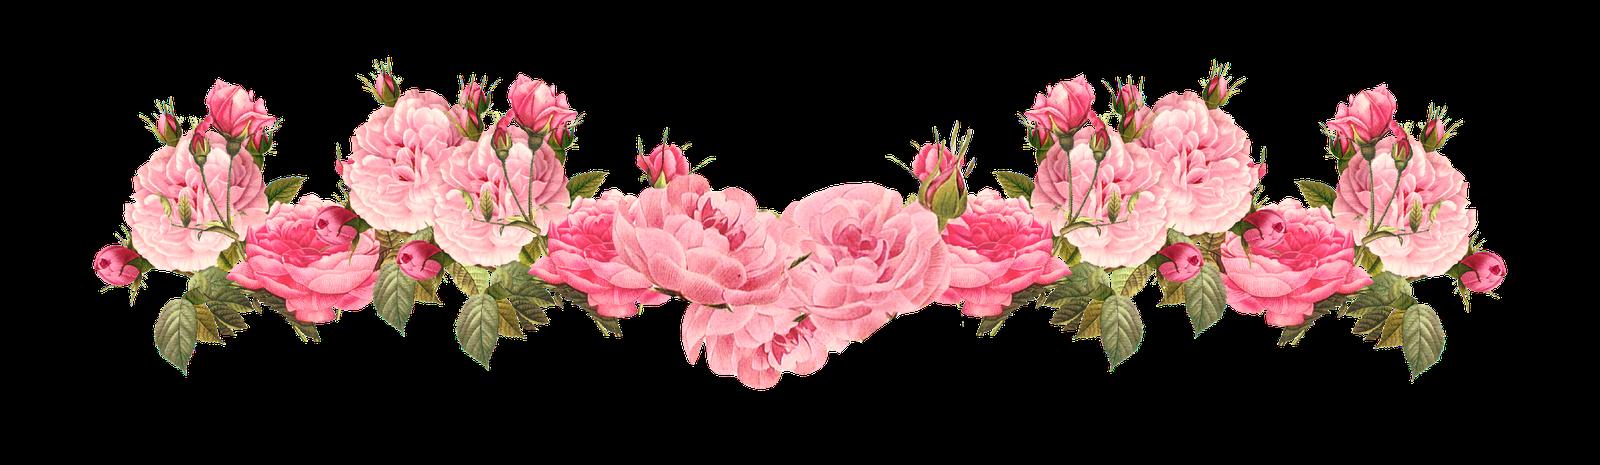 Image free vintage rose. Clipart roses kid